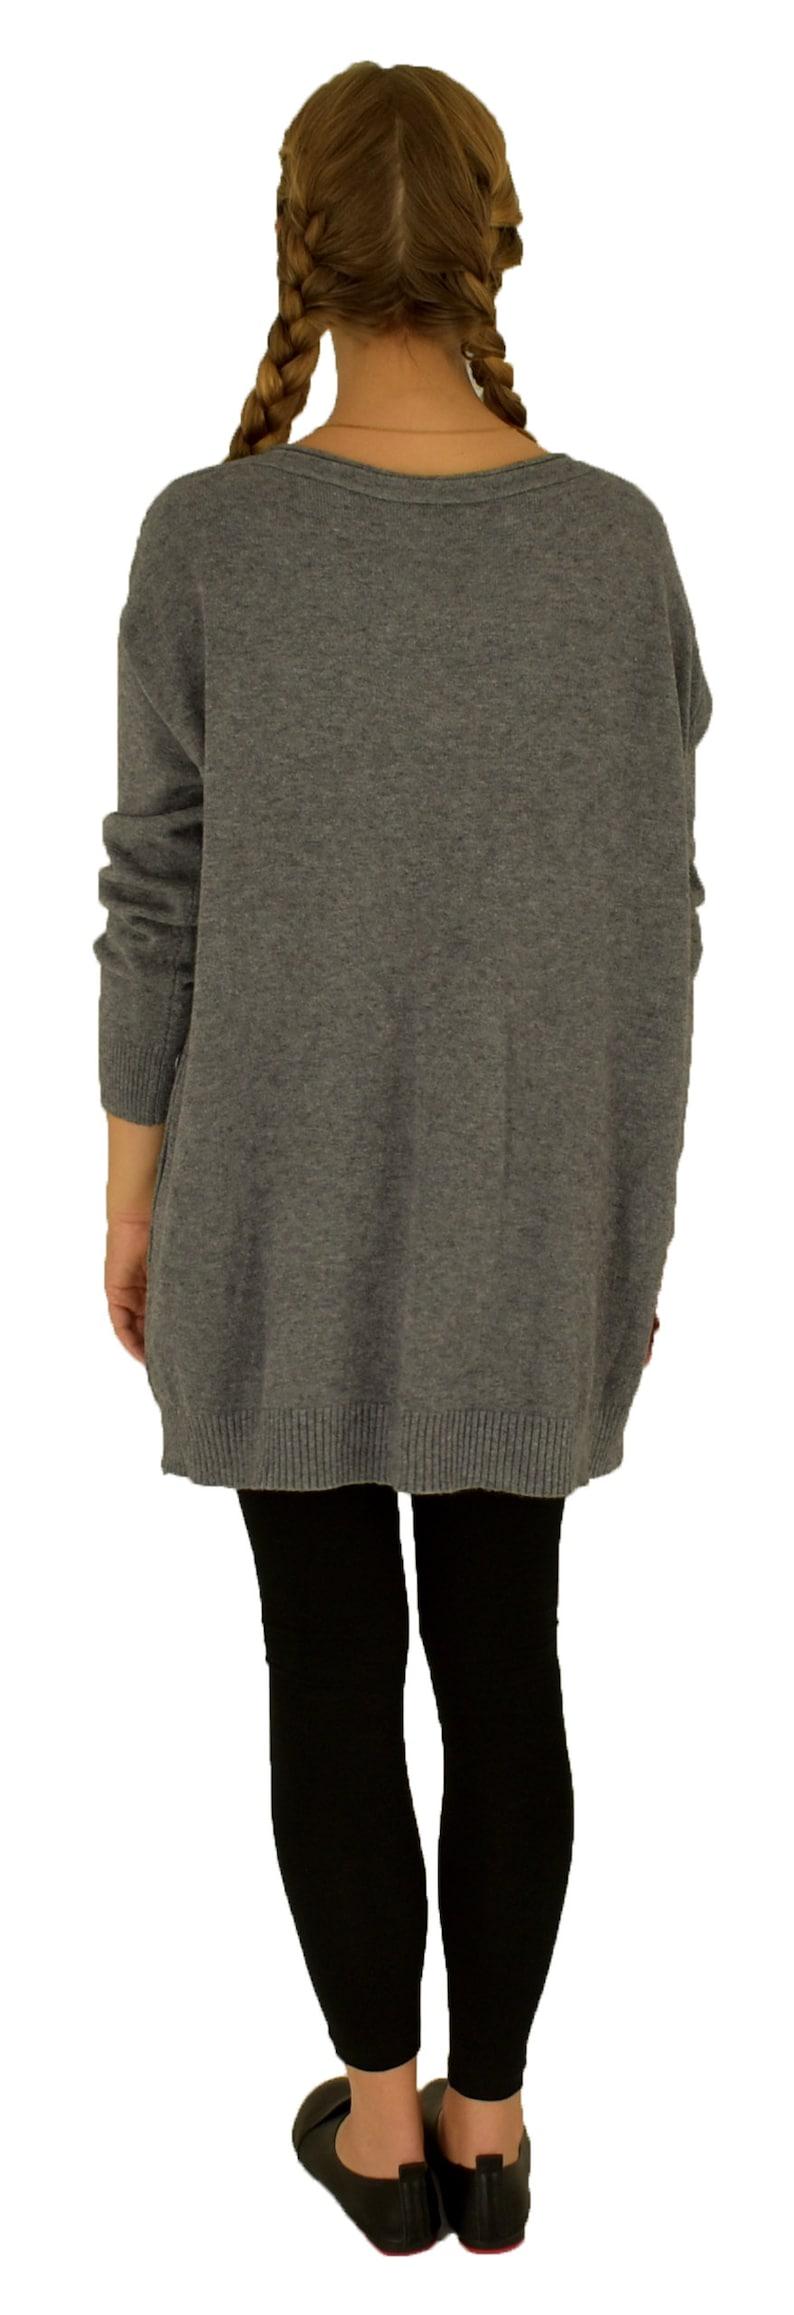 40 42 44 46 48 Plus Size Winter Sweater LH800GR Stricking Tunics one Size Women Gr M-XXL Grey Gr